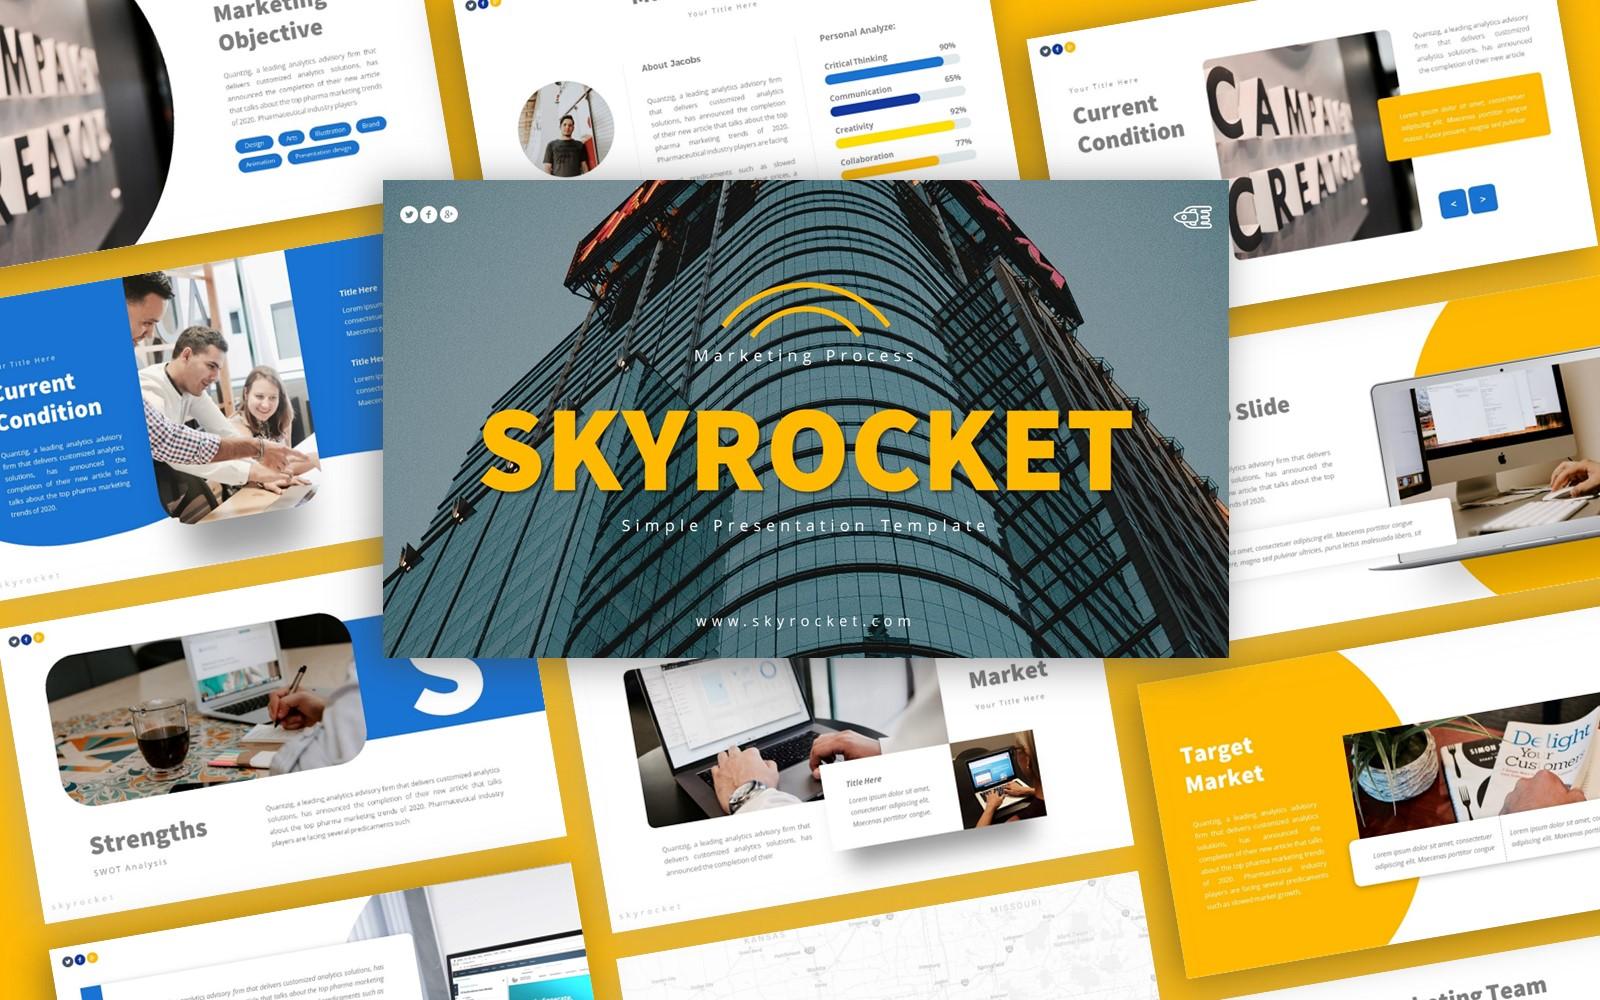 Skyrocket Marketing Presentation PowerPoint Template